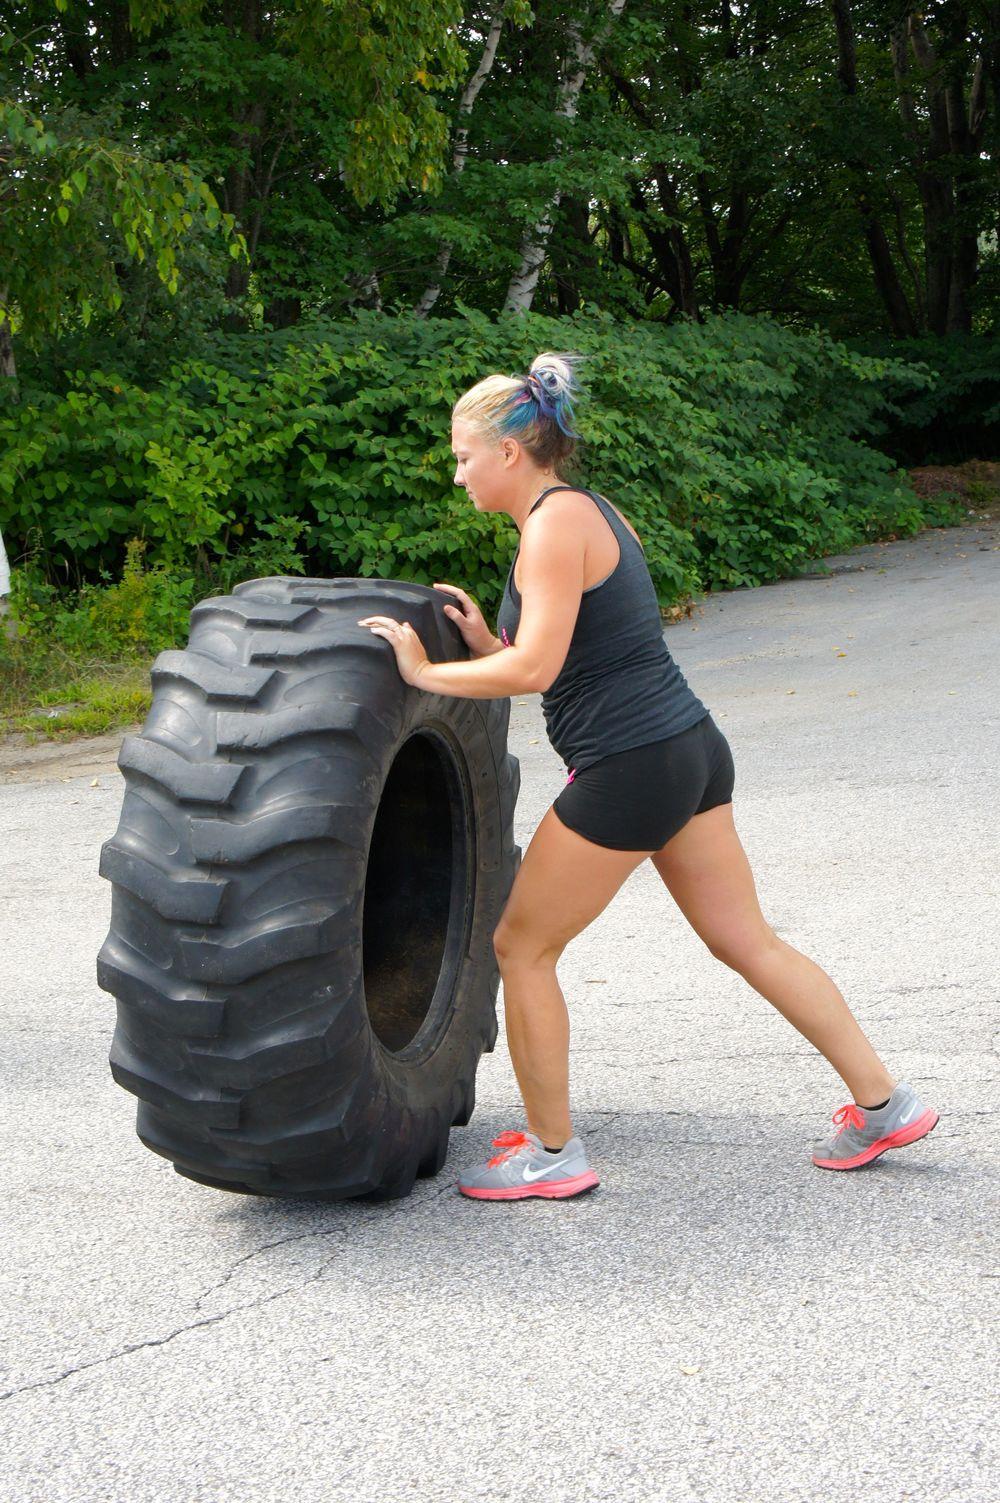 Meg. Tire flips